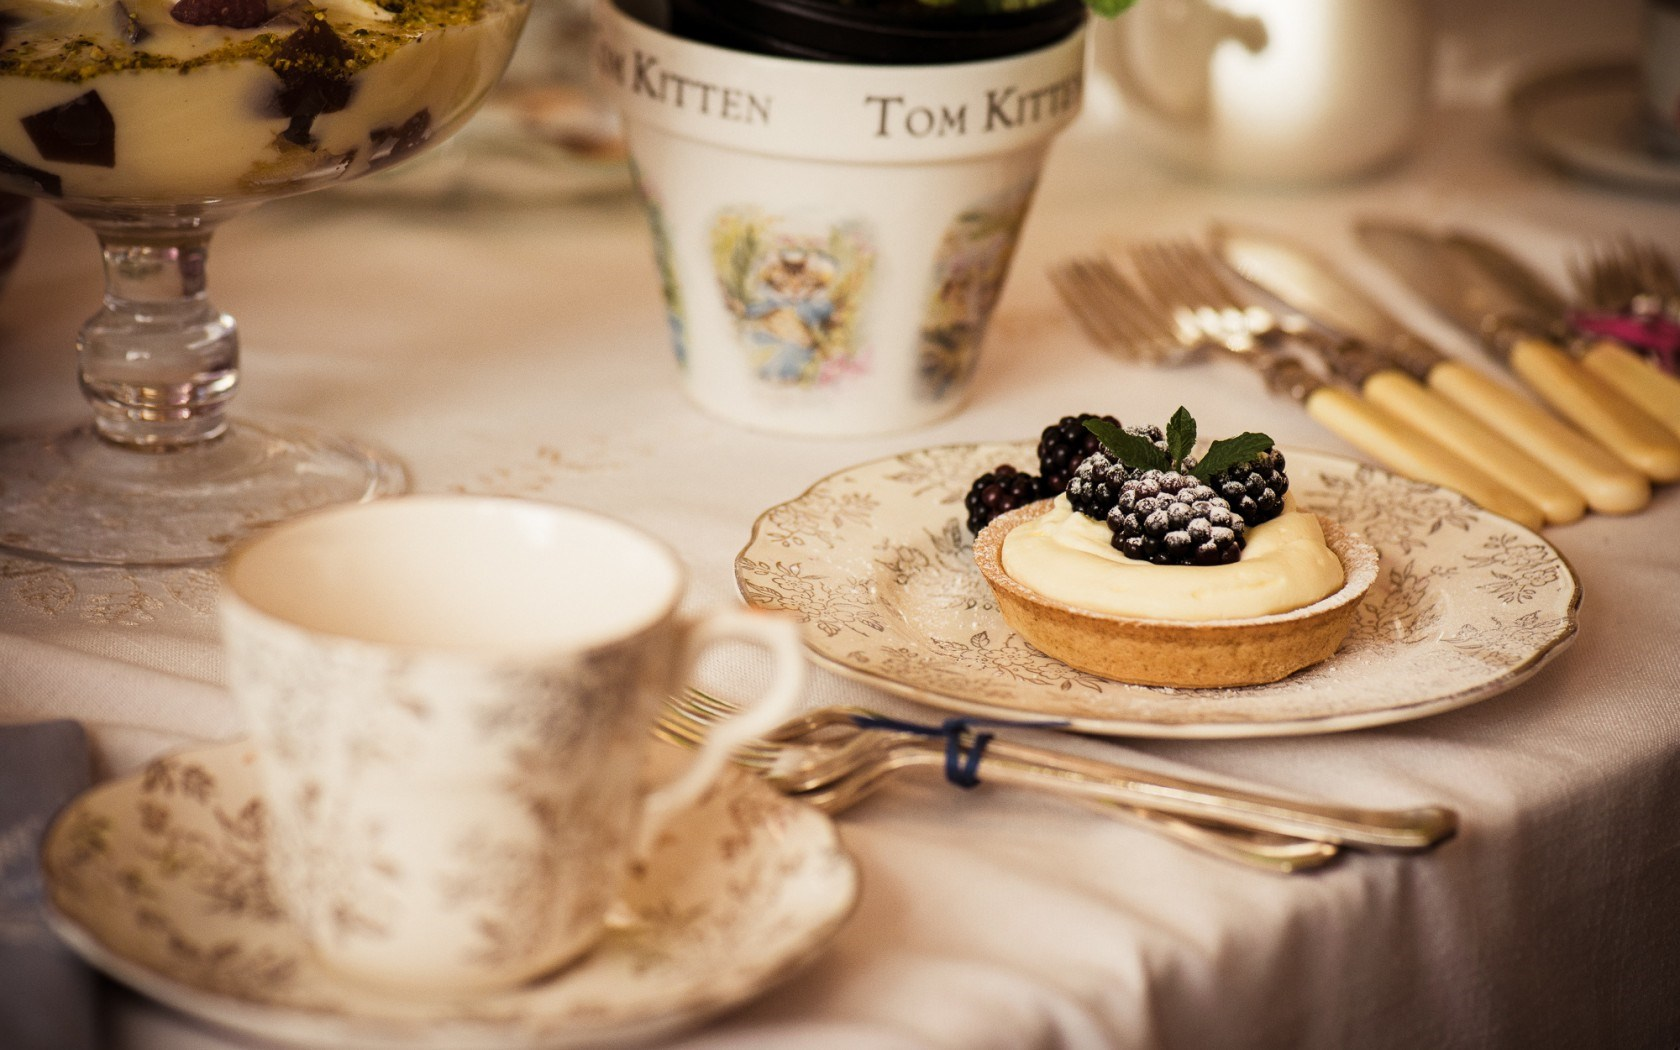 Blackberry Dessert Sweet